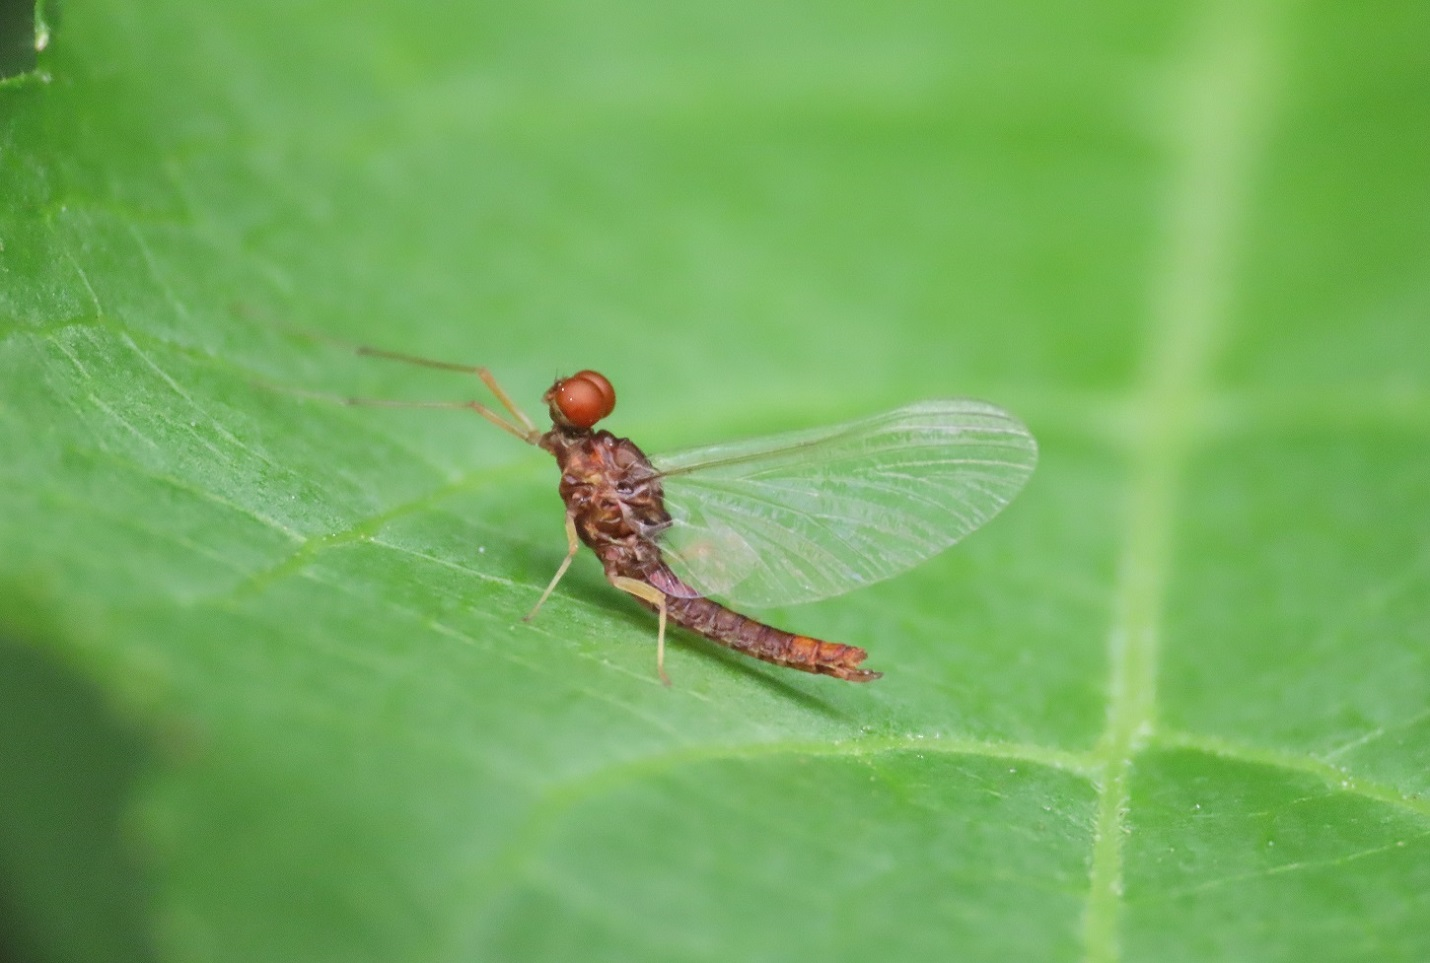 Ephemeroptera da identificare - Serratella ignita